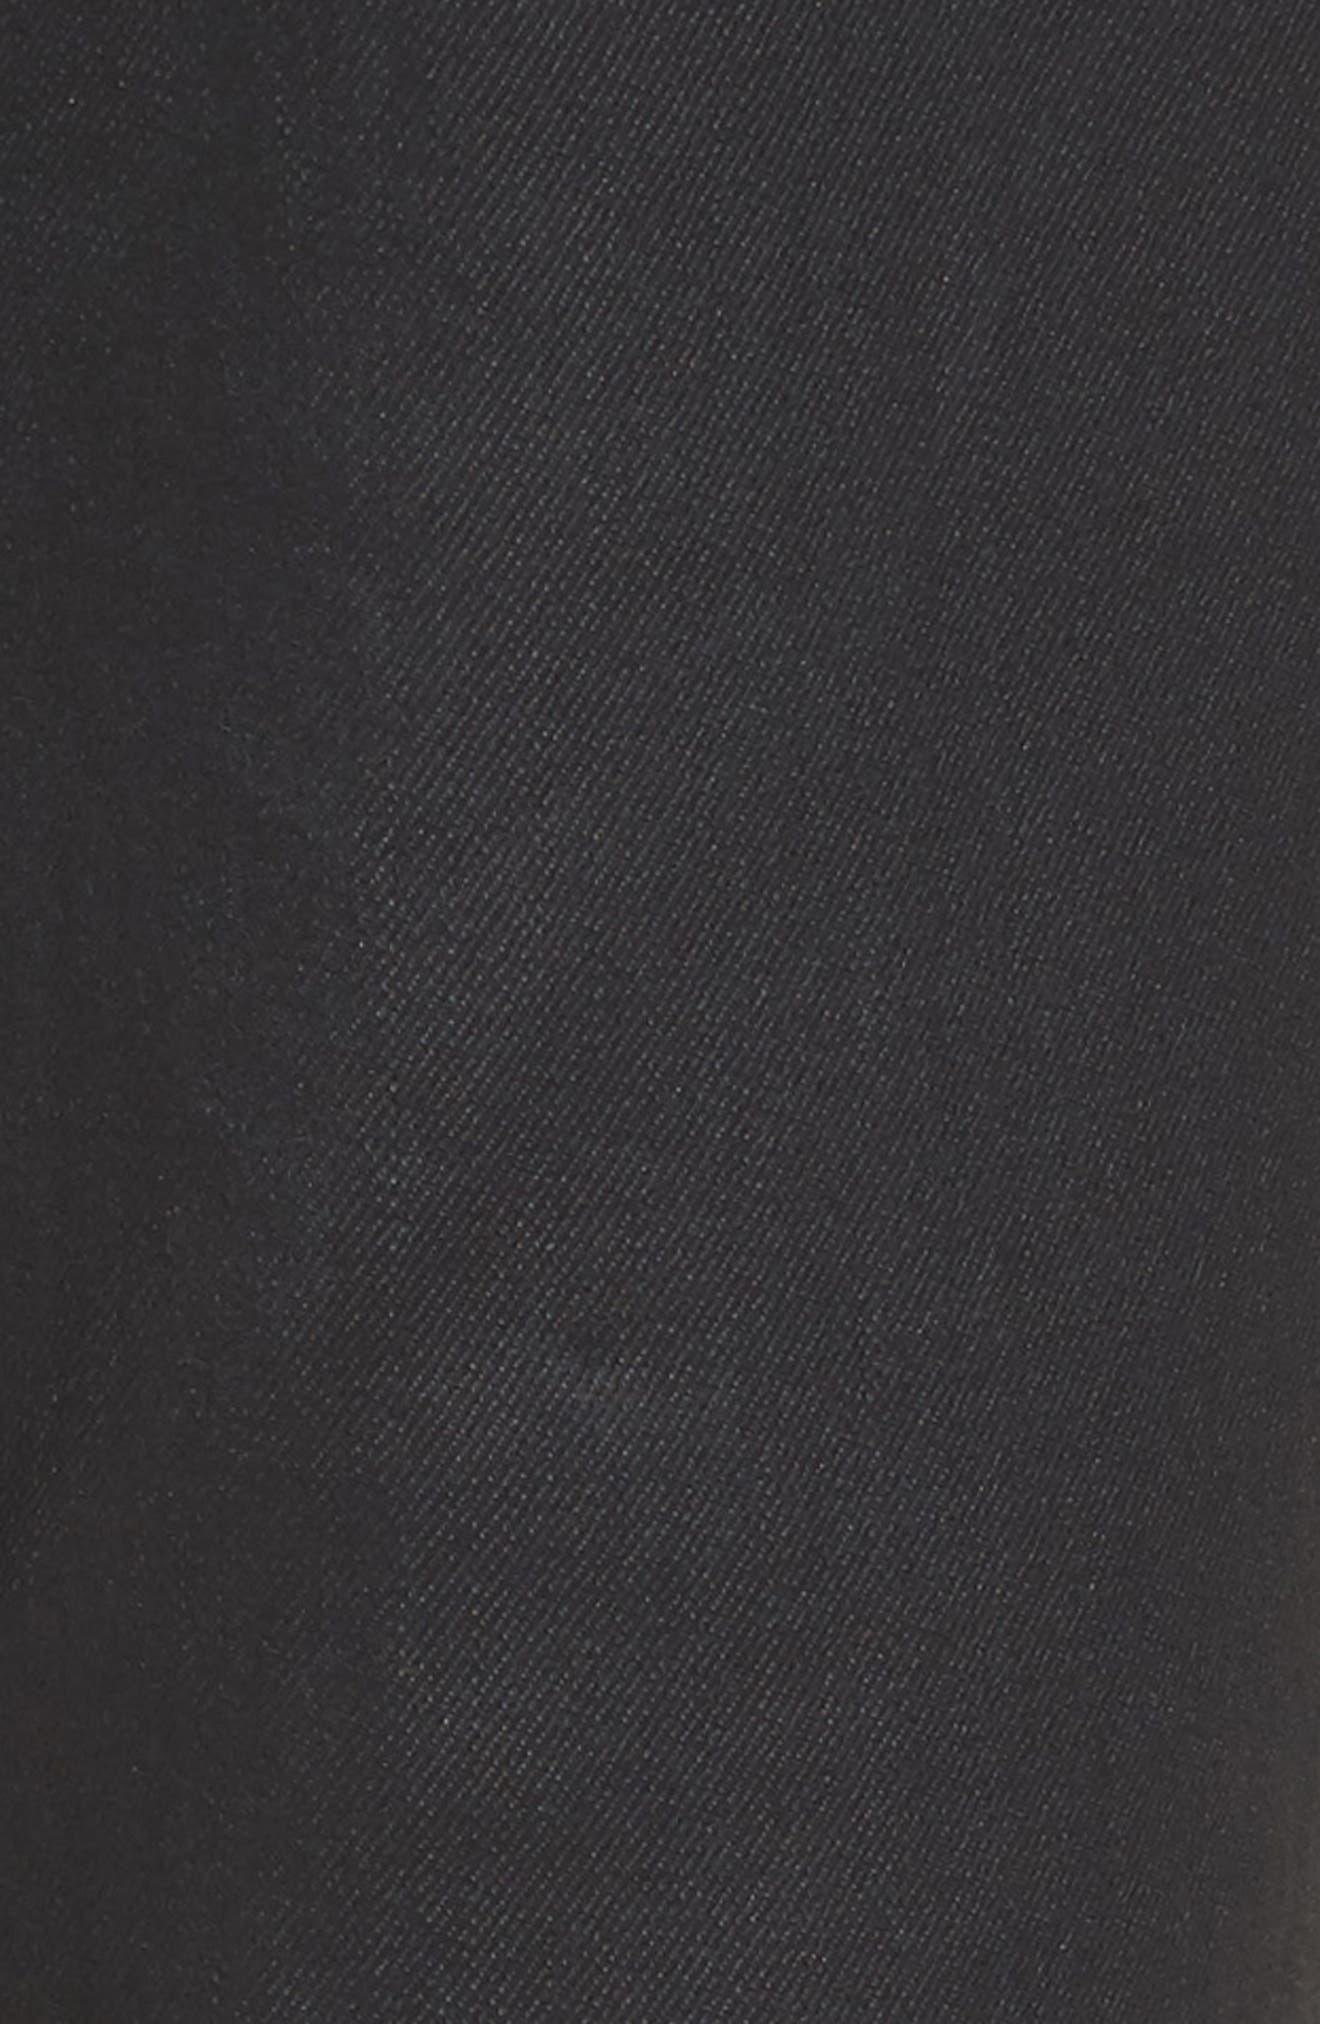 Coated Skinny Jeans,                             Alternate thumbnail 5, color,                             Black